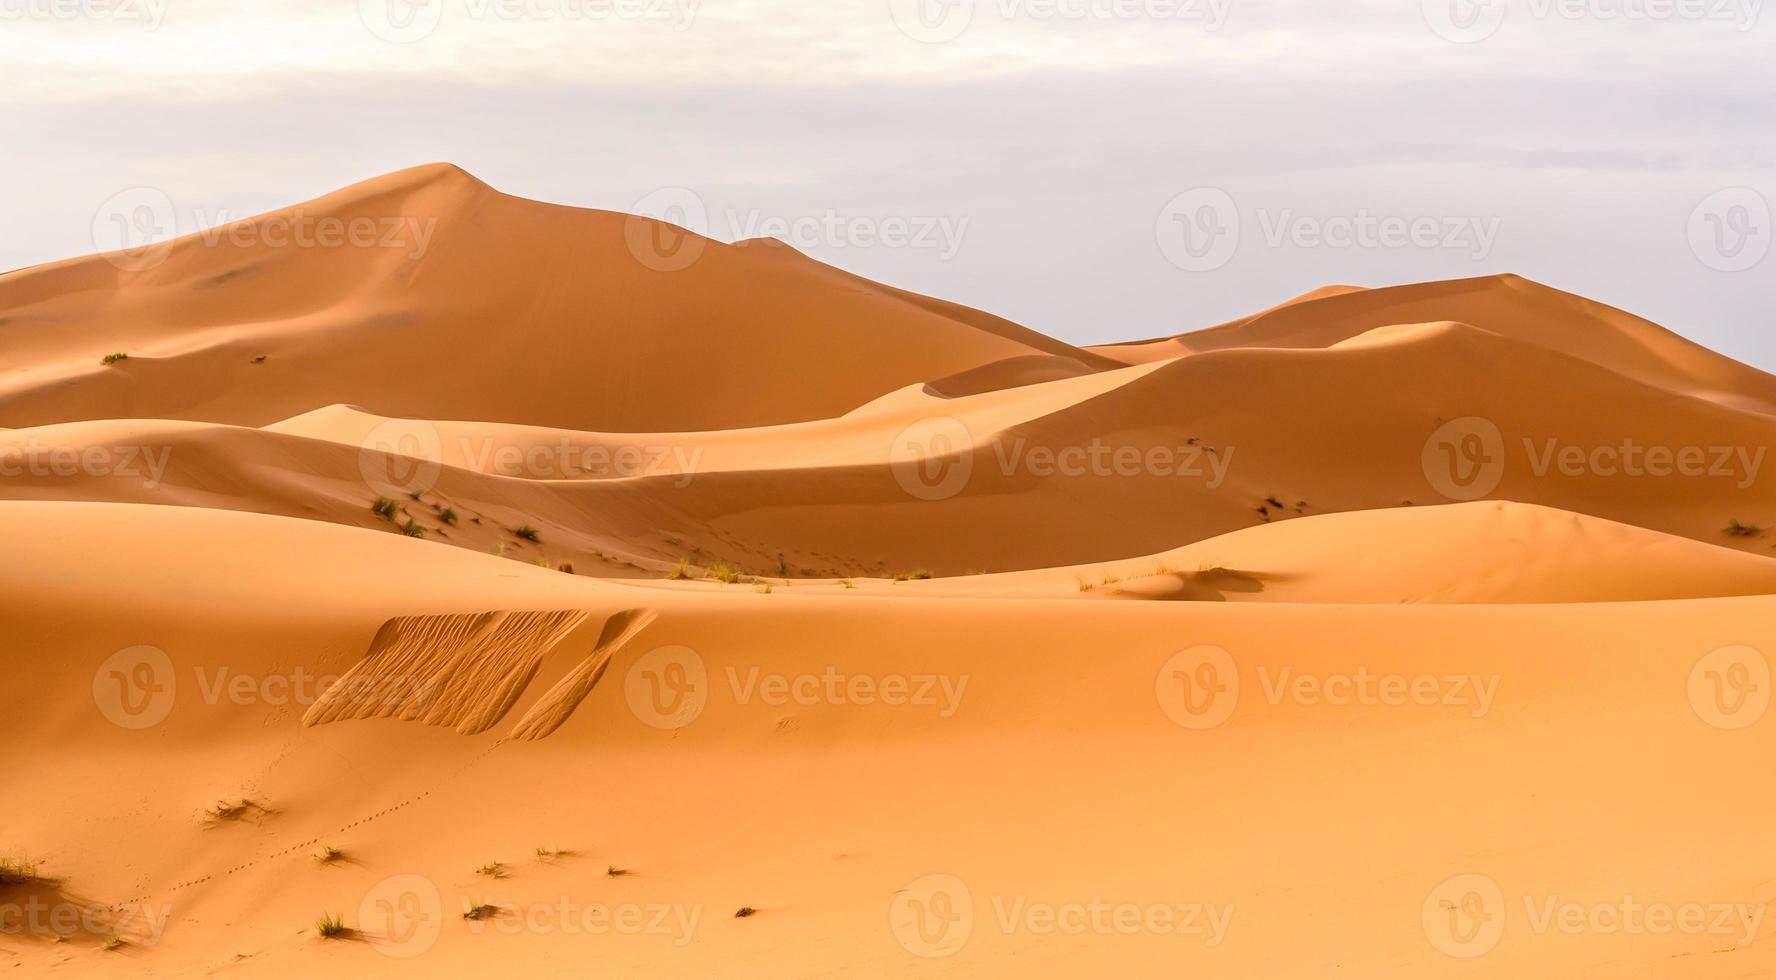 Erg Chebbi sand dunes in the Moroccan desert photo